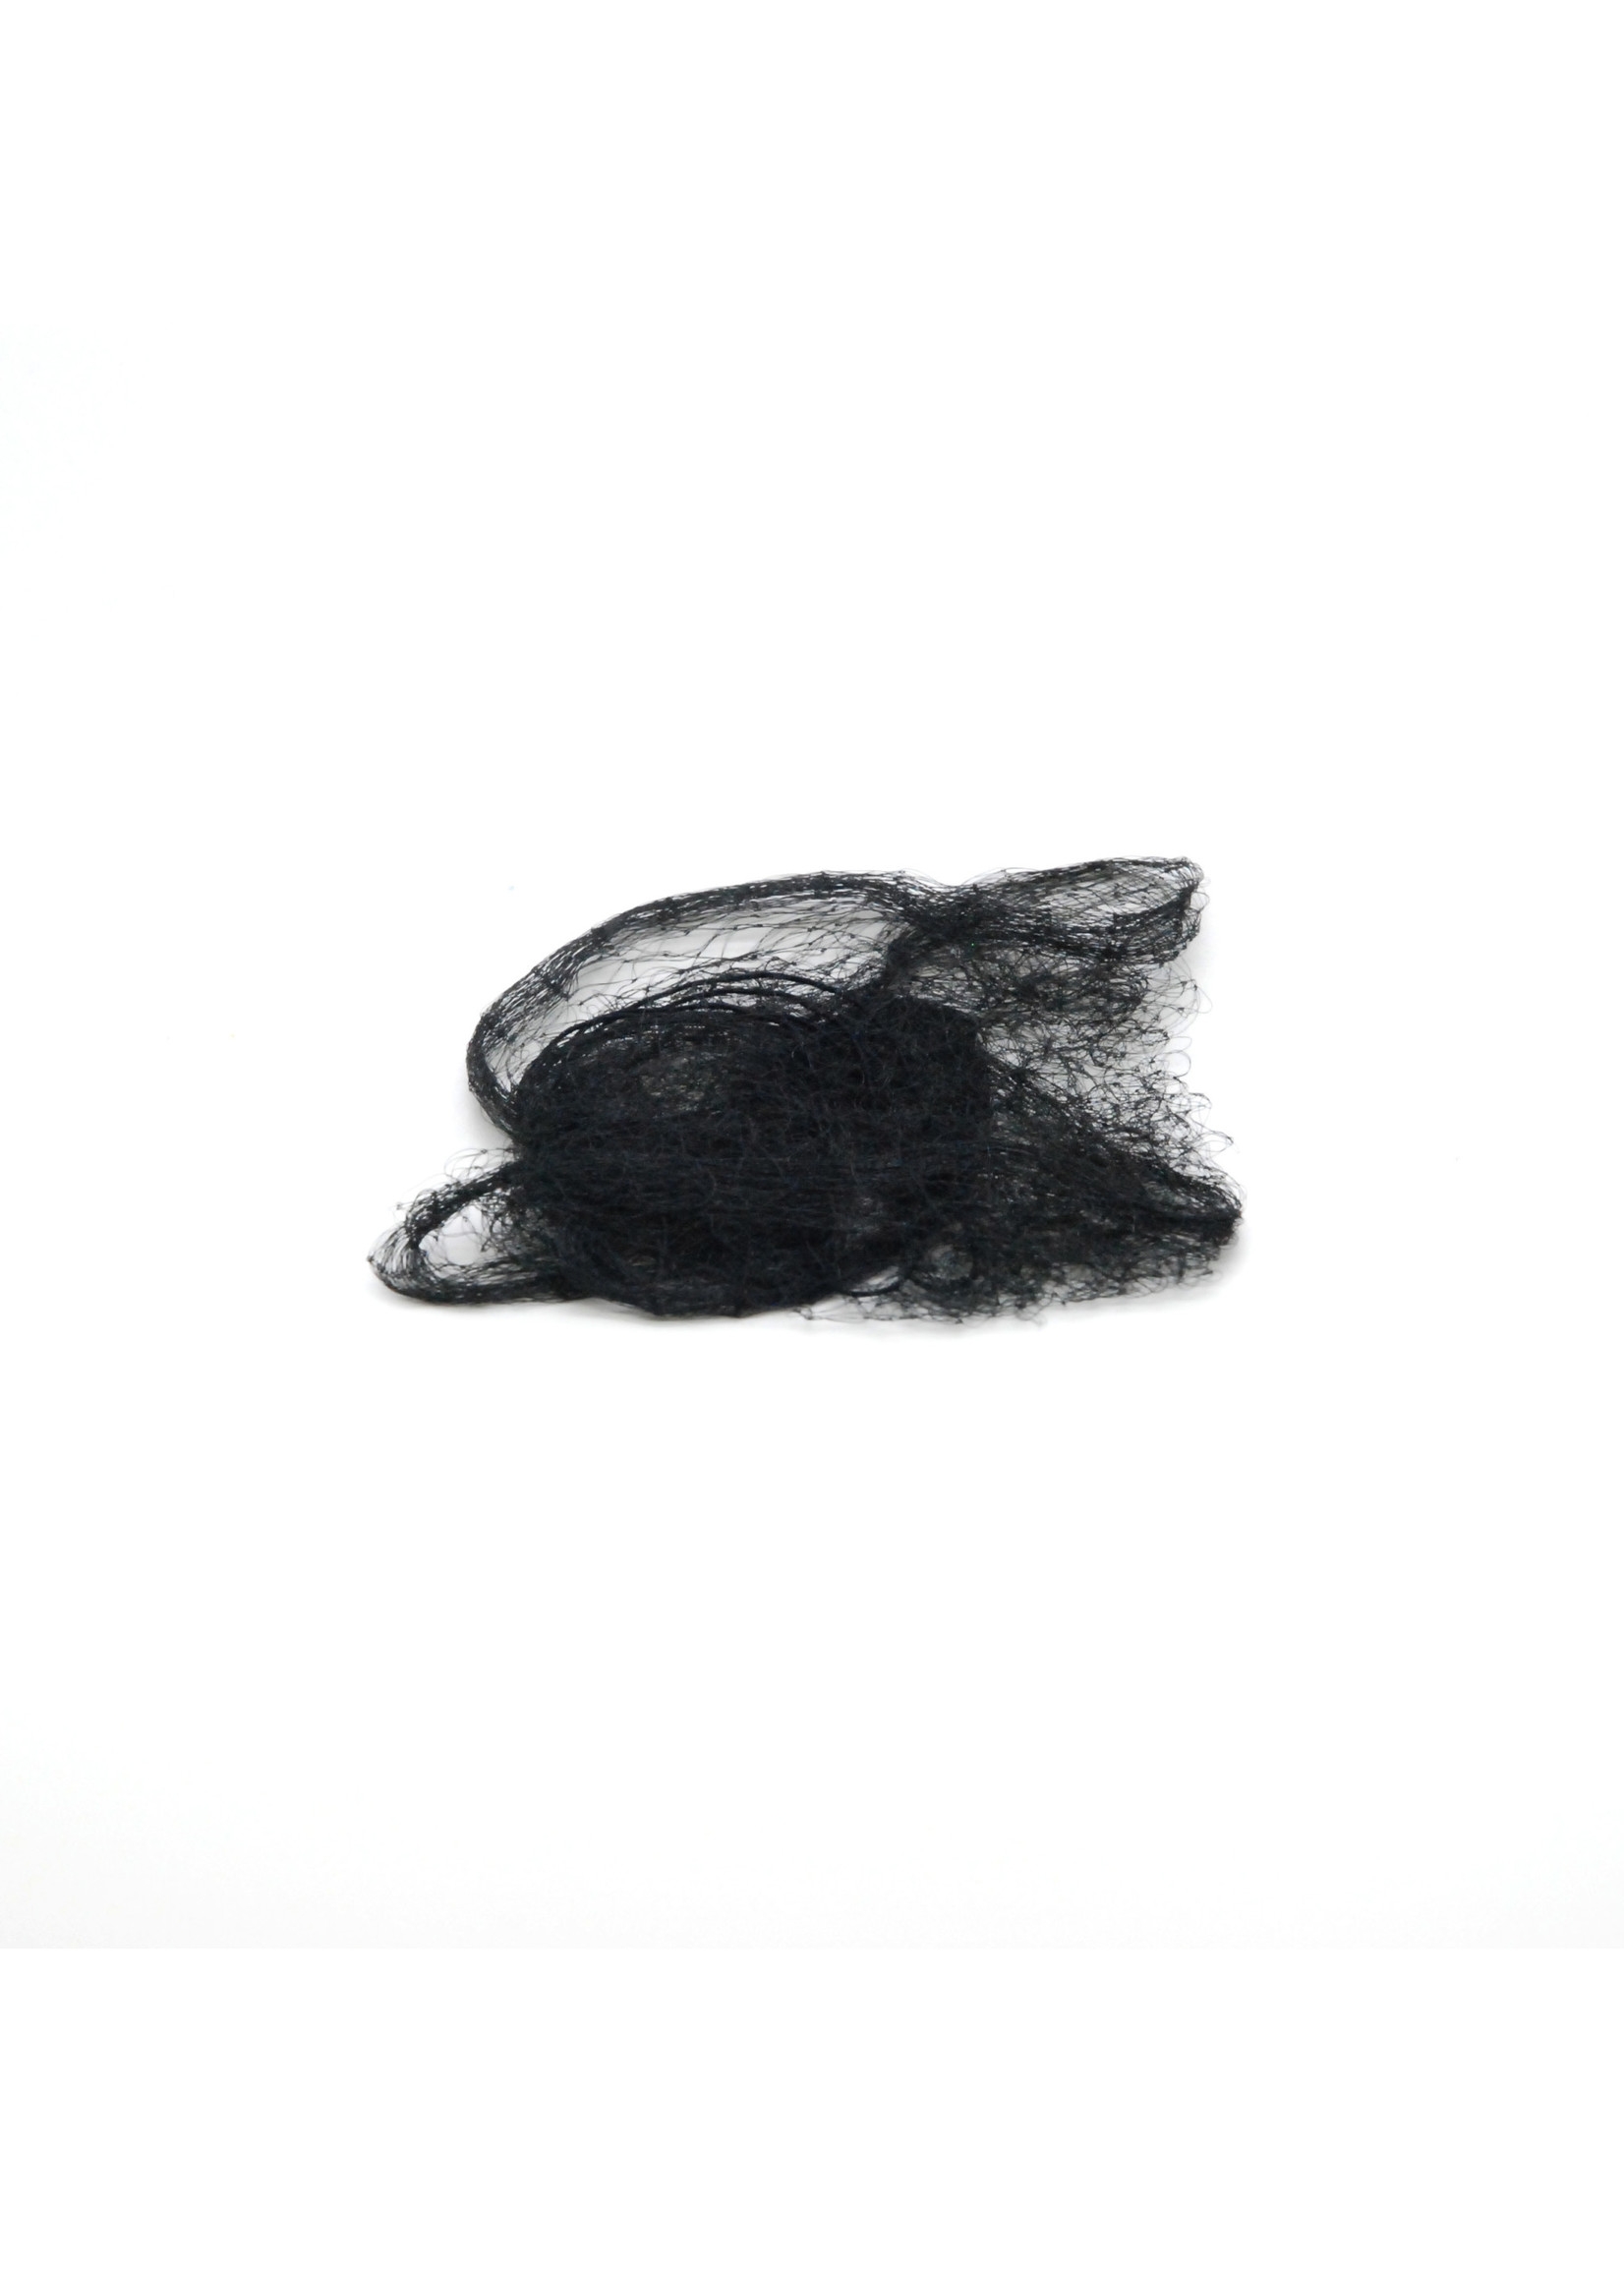 Pillows for Pointes Filet pour cheveux et chignon - Pillows of Pointes